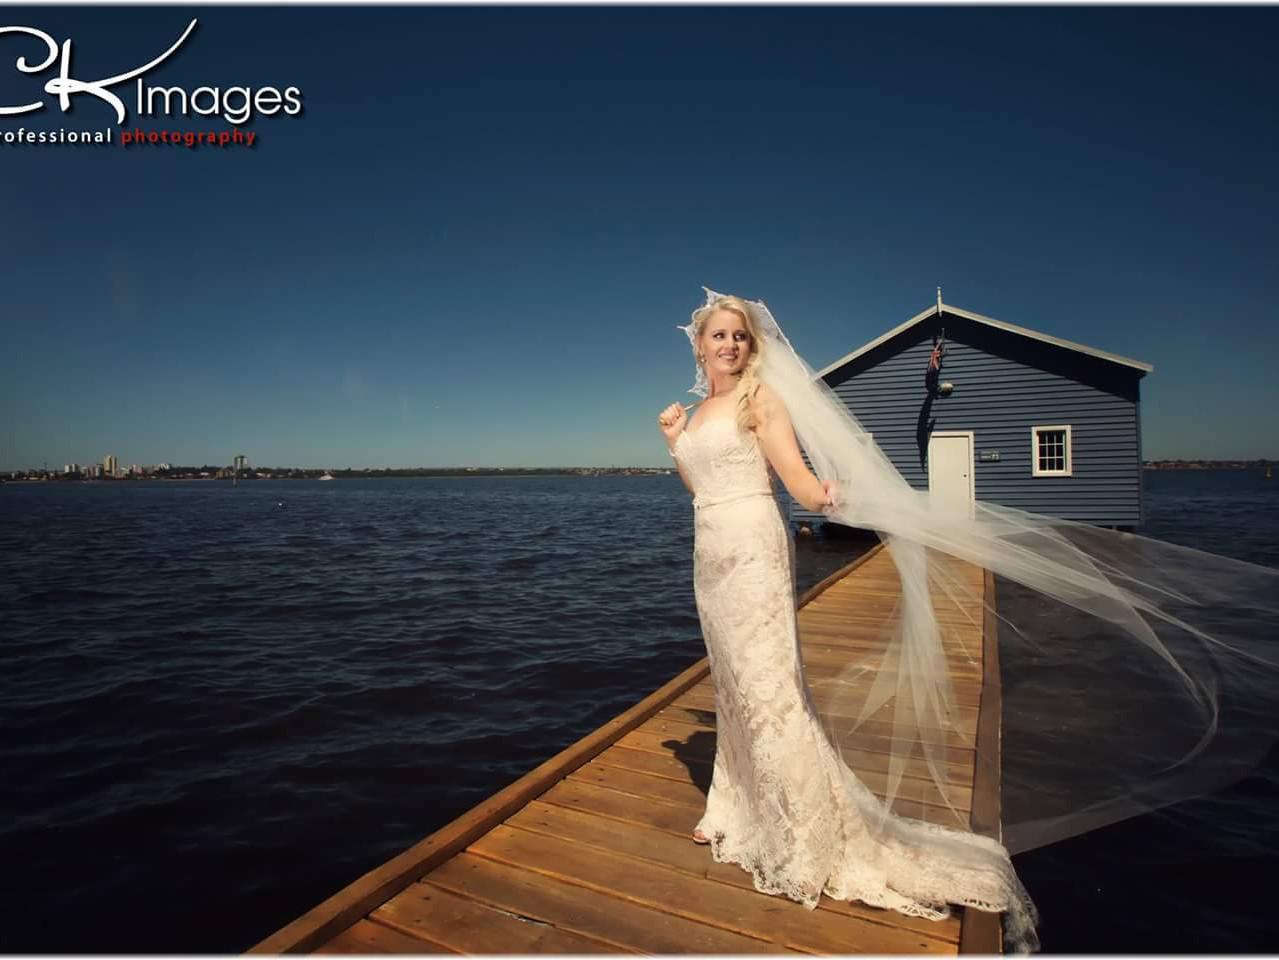 Artistic Bridal photo